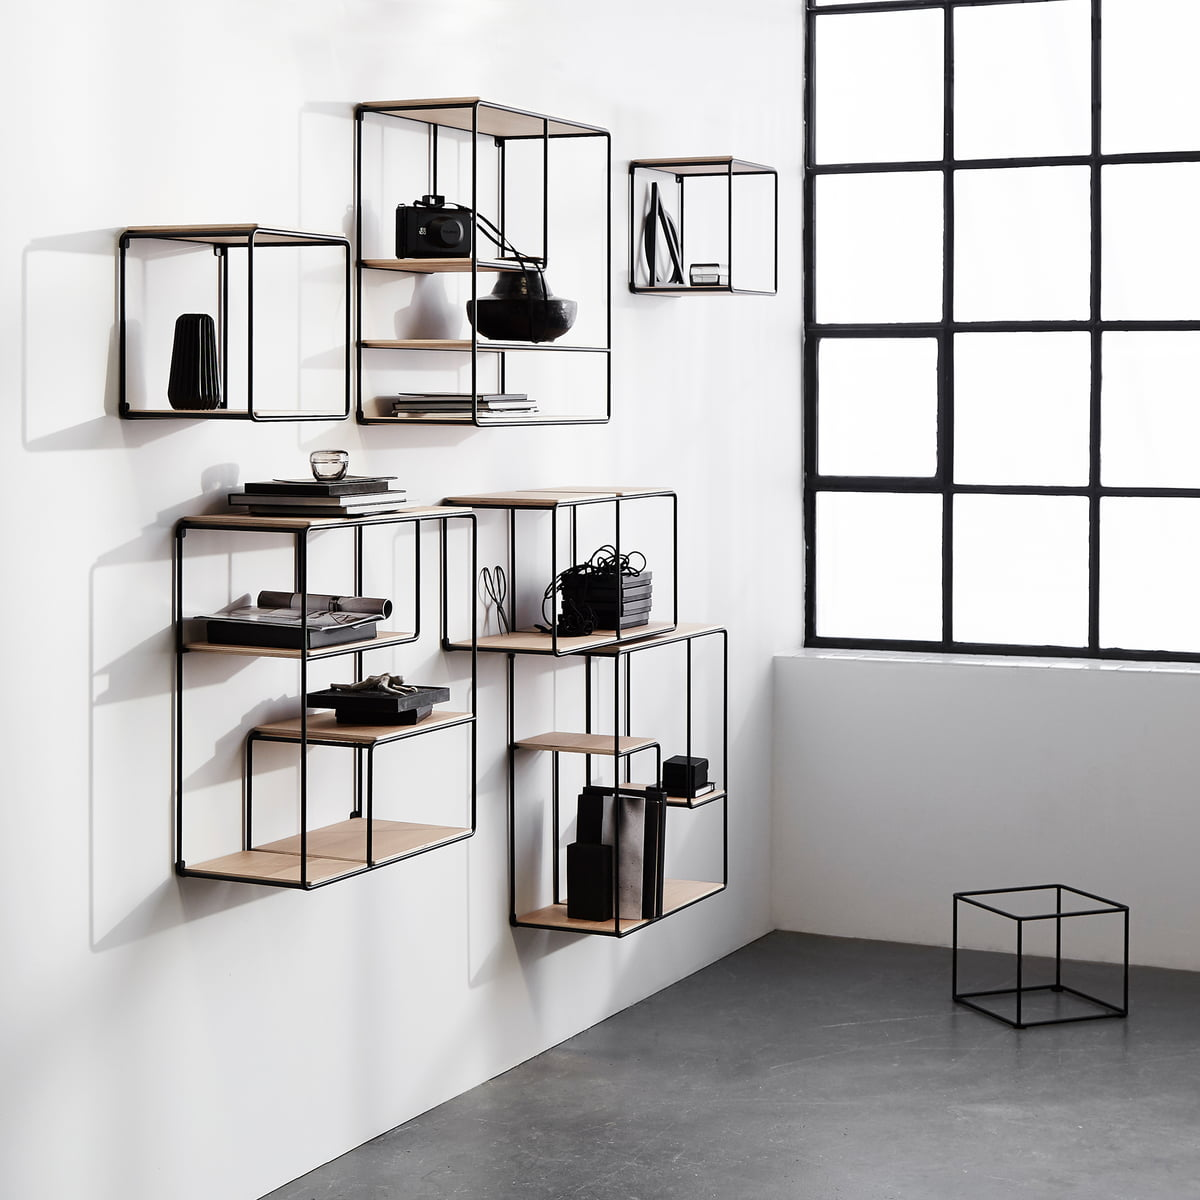 anywhere 1x1 wandregal von korridor. Black Bedroom Furniture Sets. Home Design Ideas